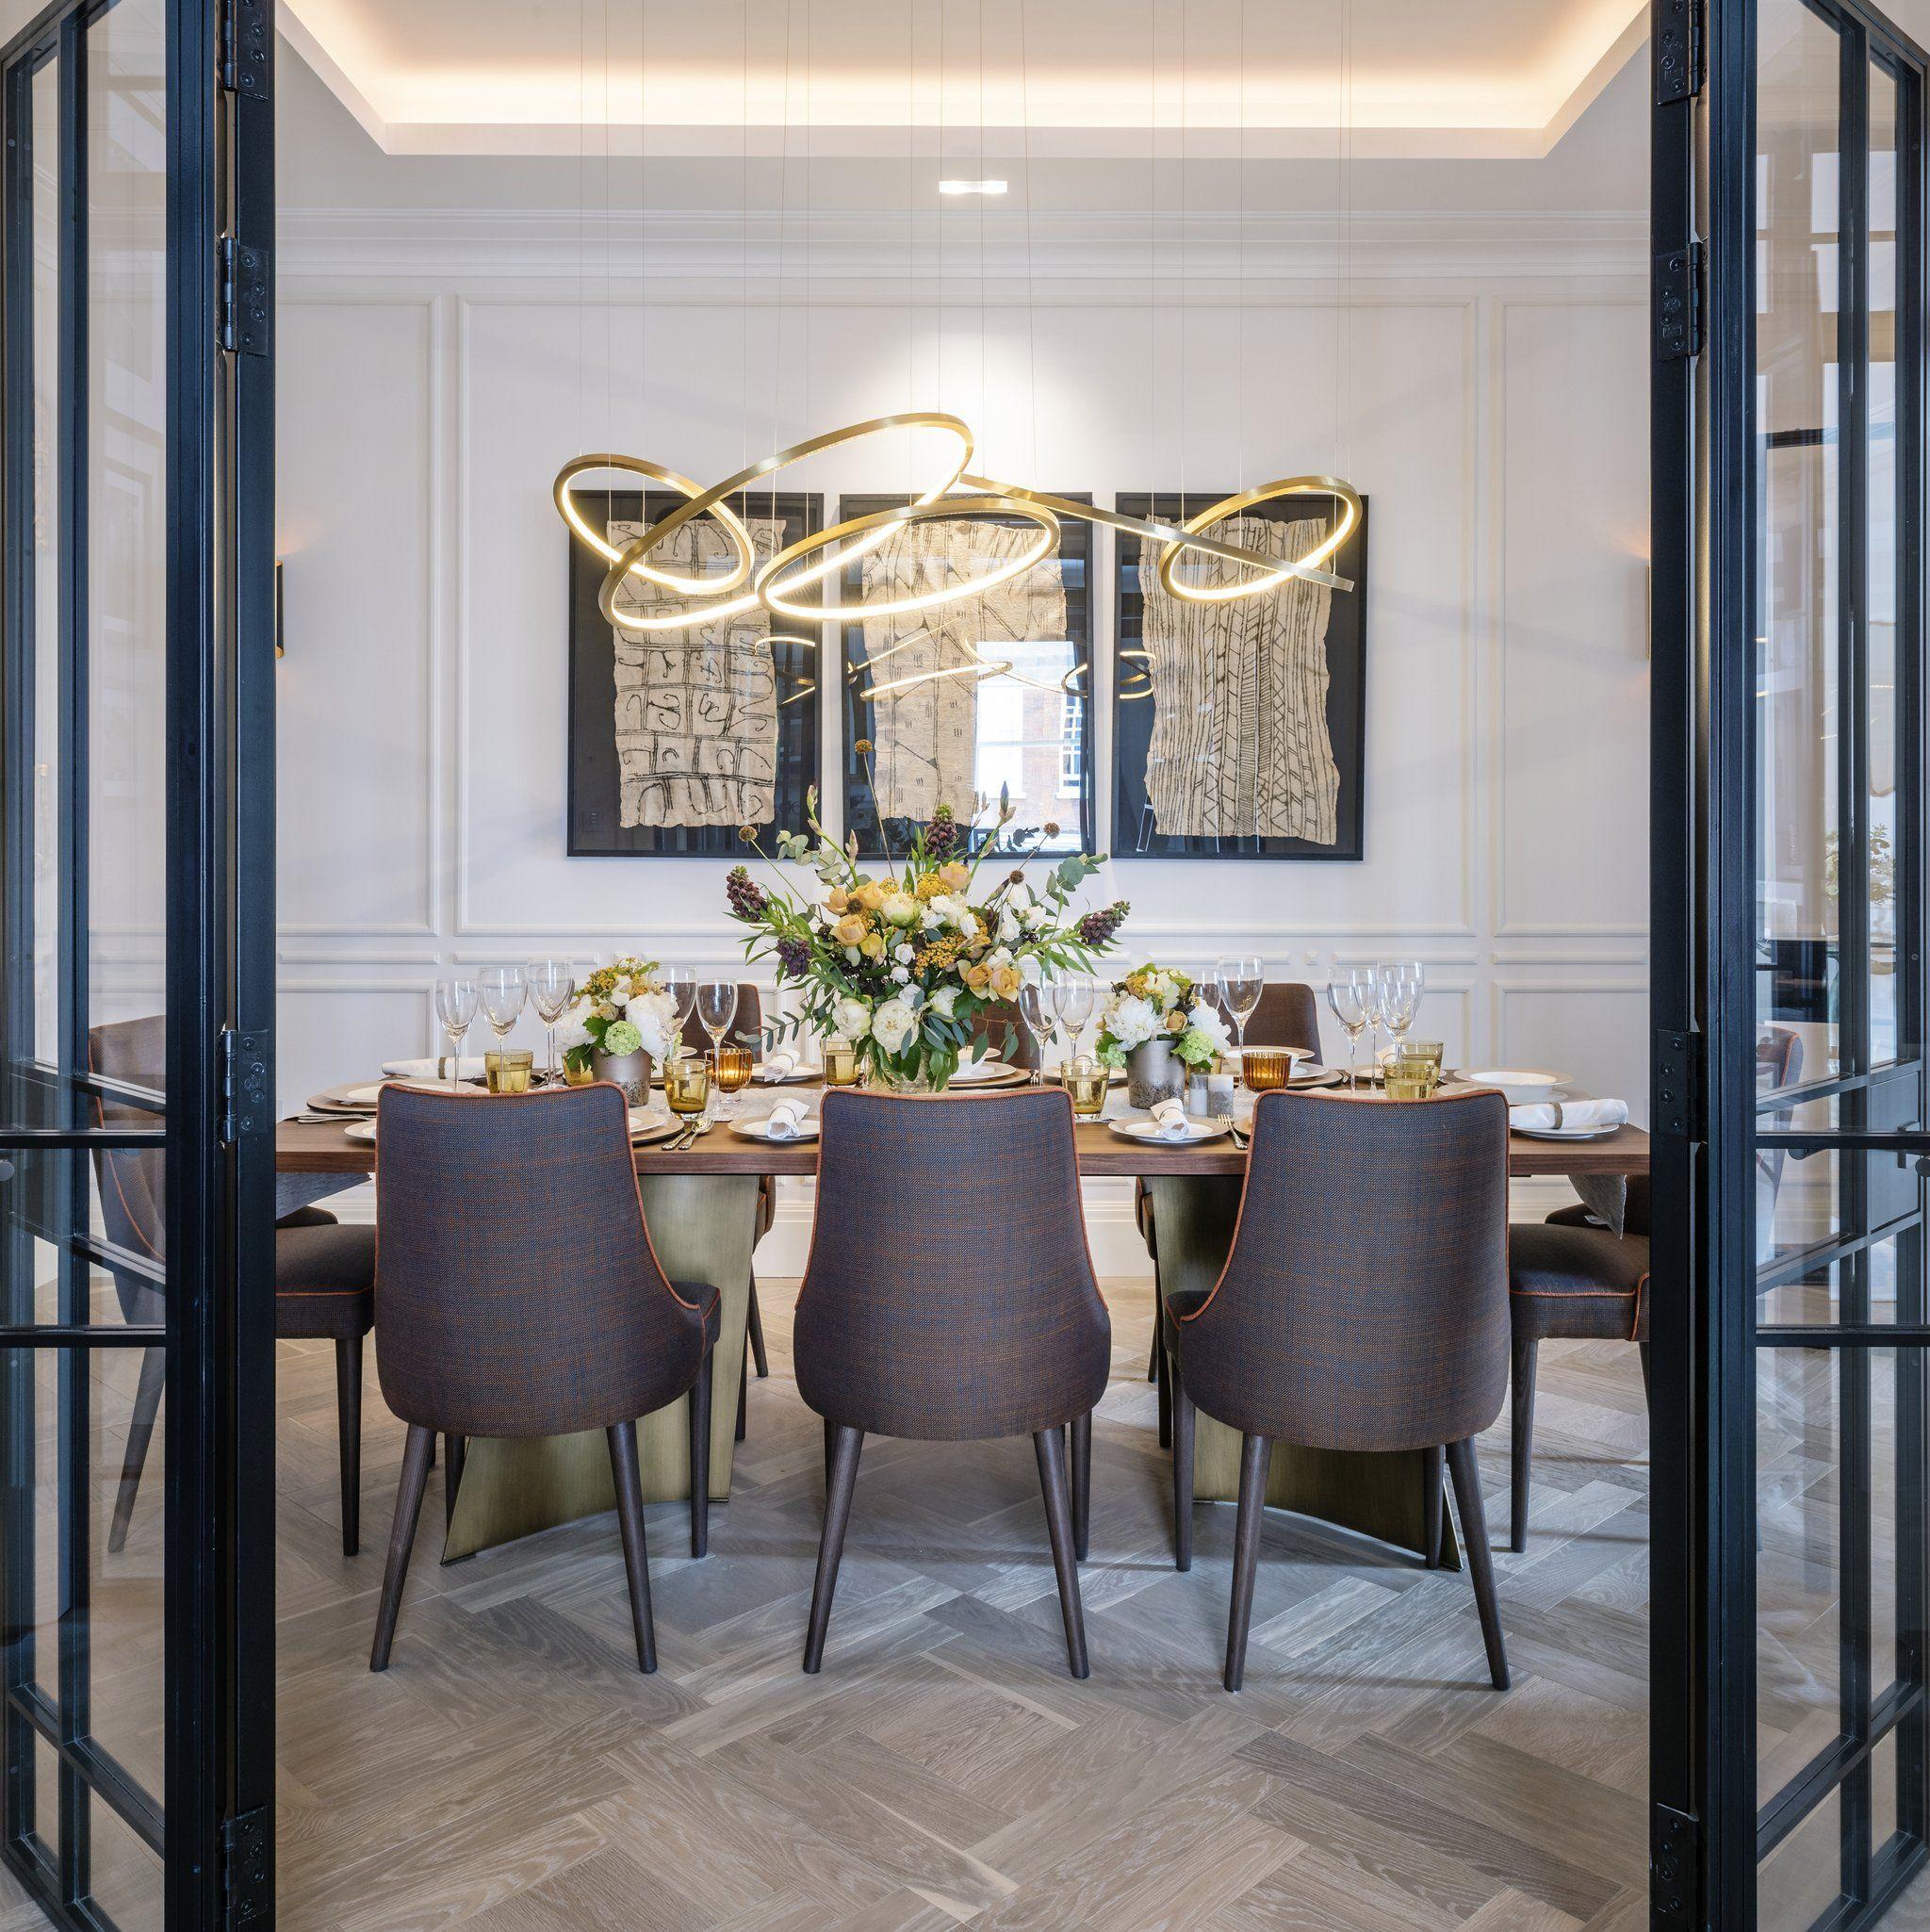 Lohja Tornio Cameron Design House In 2020 House Design Metal Pendant Lamps Design